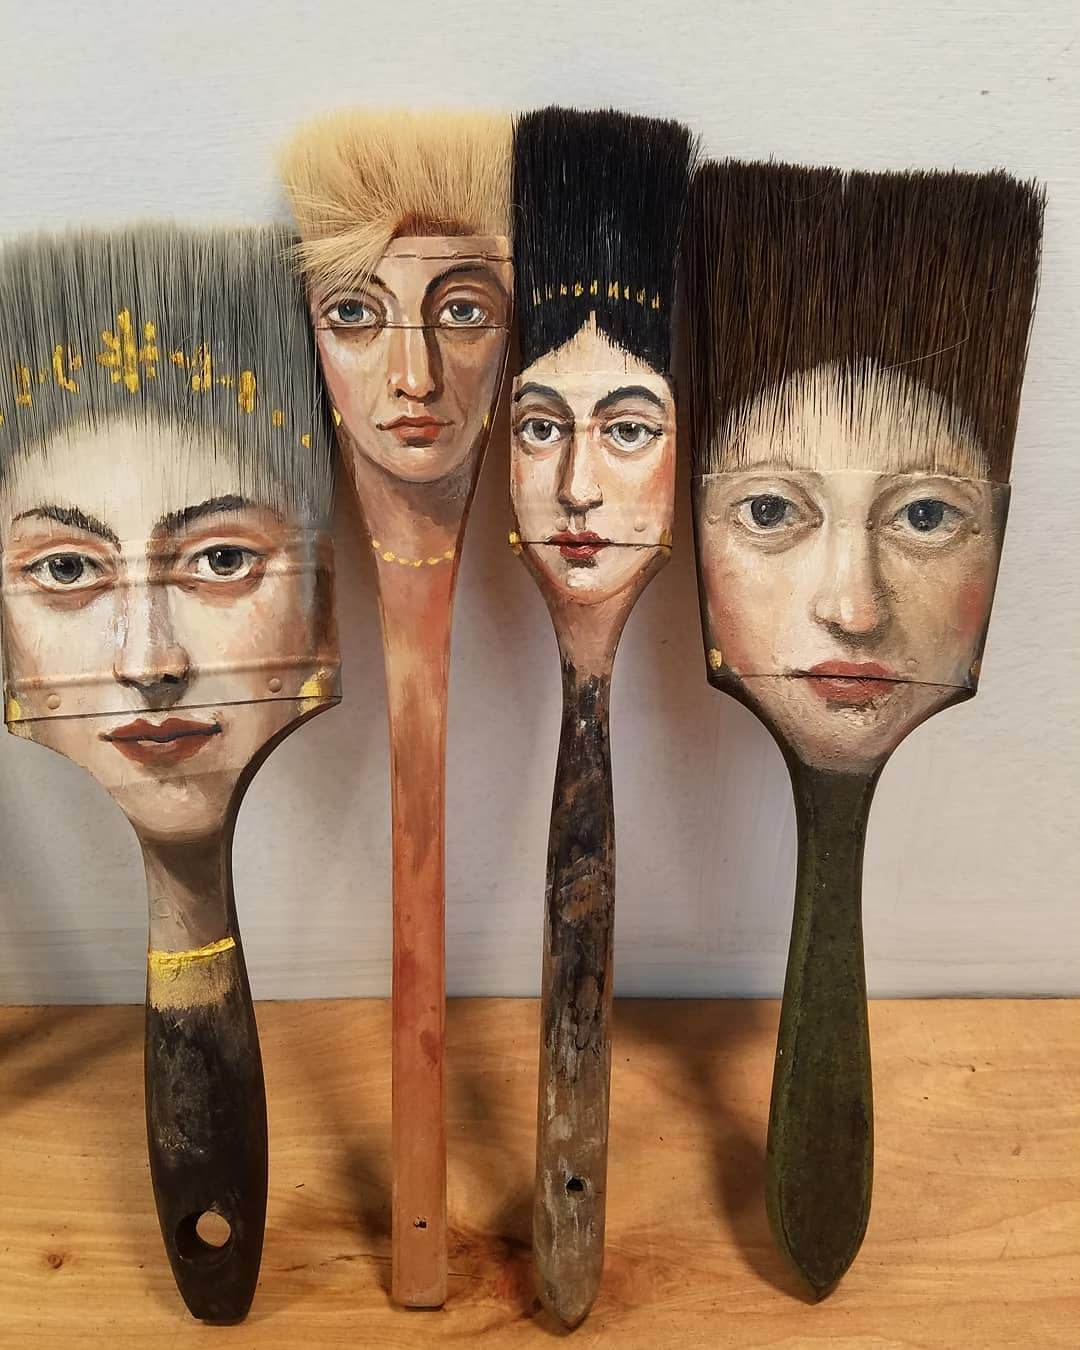 Artworks Alexandra Dillon - art - inag | ello